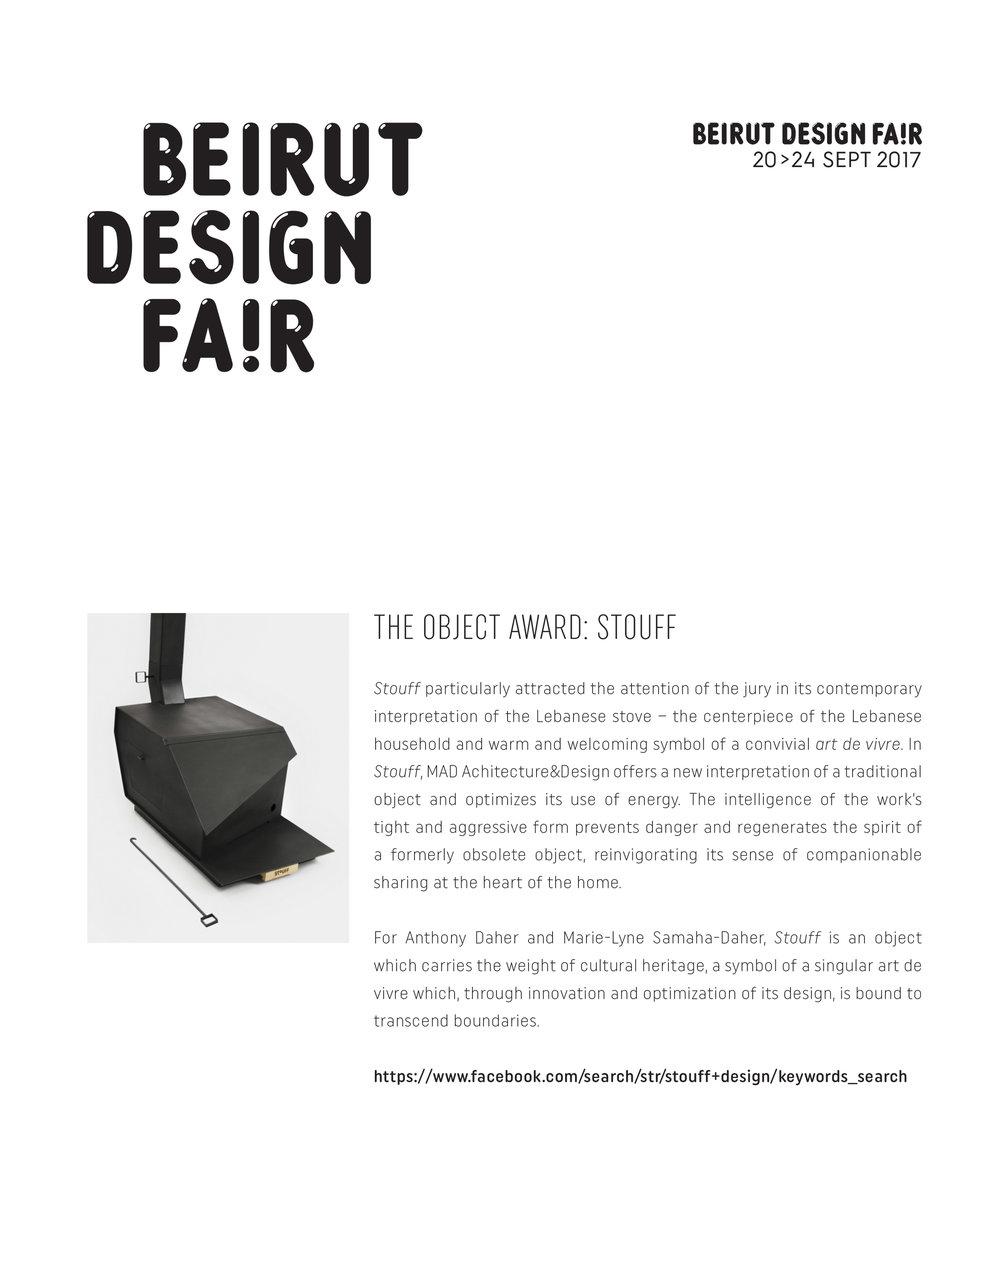 Beirut Design Fair 2017 - The Object Award : Stouff